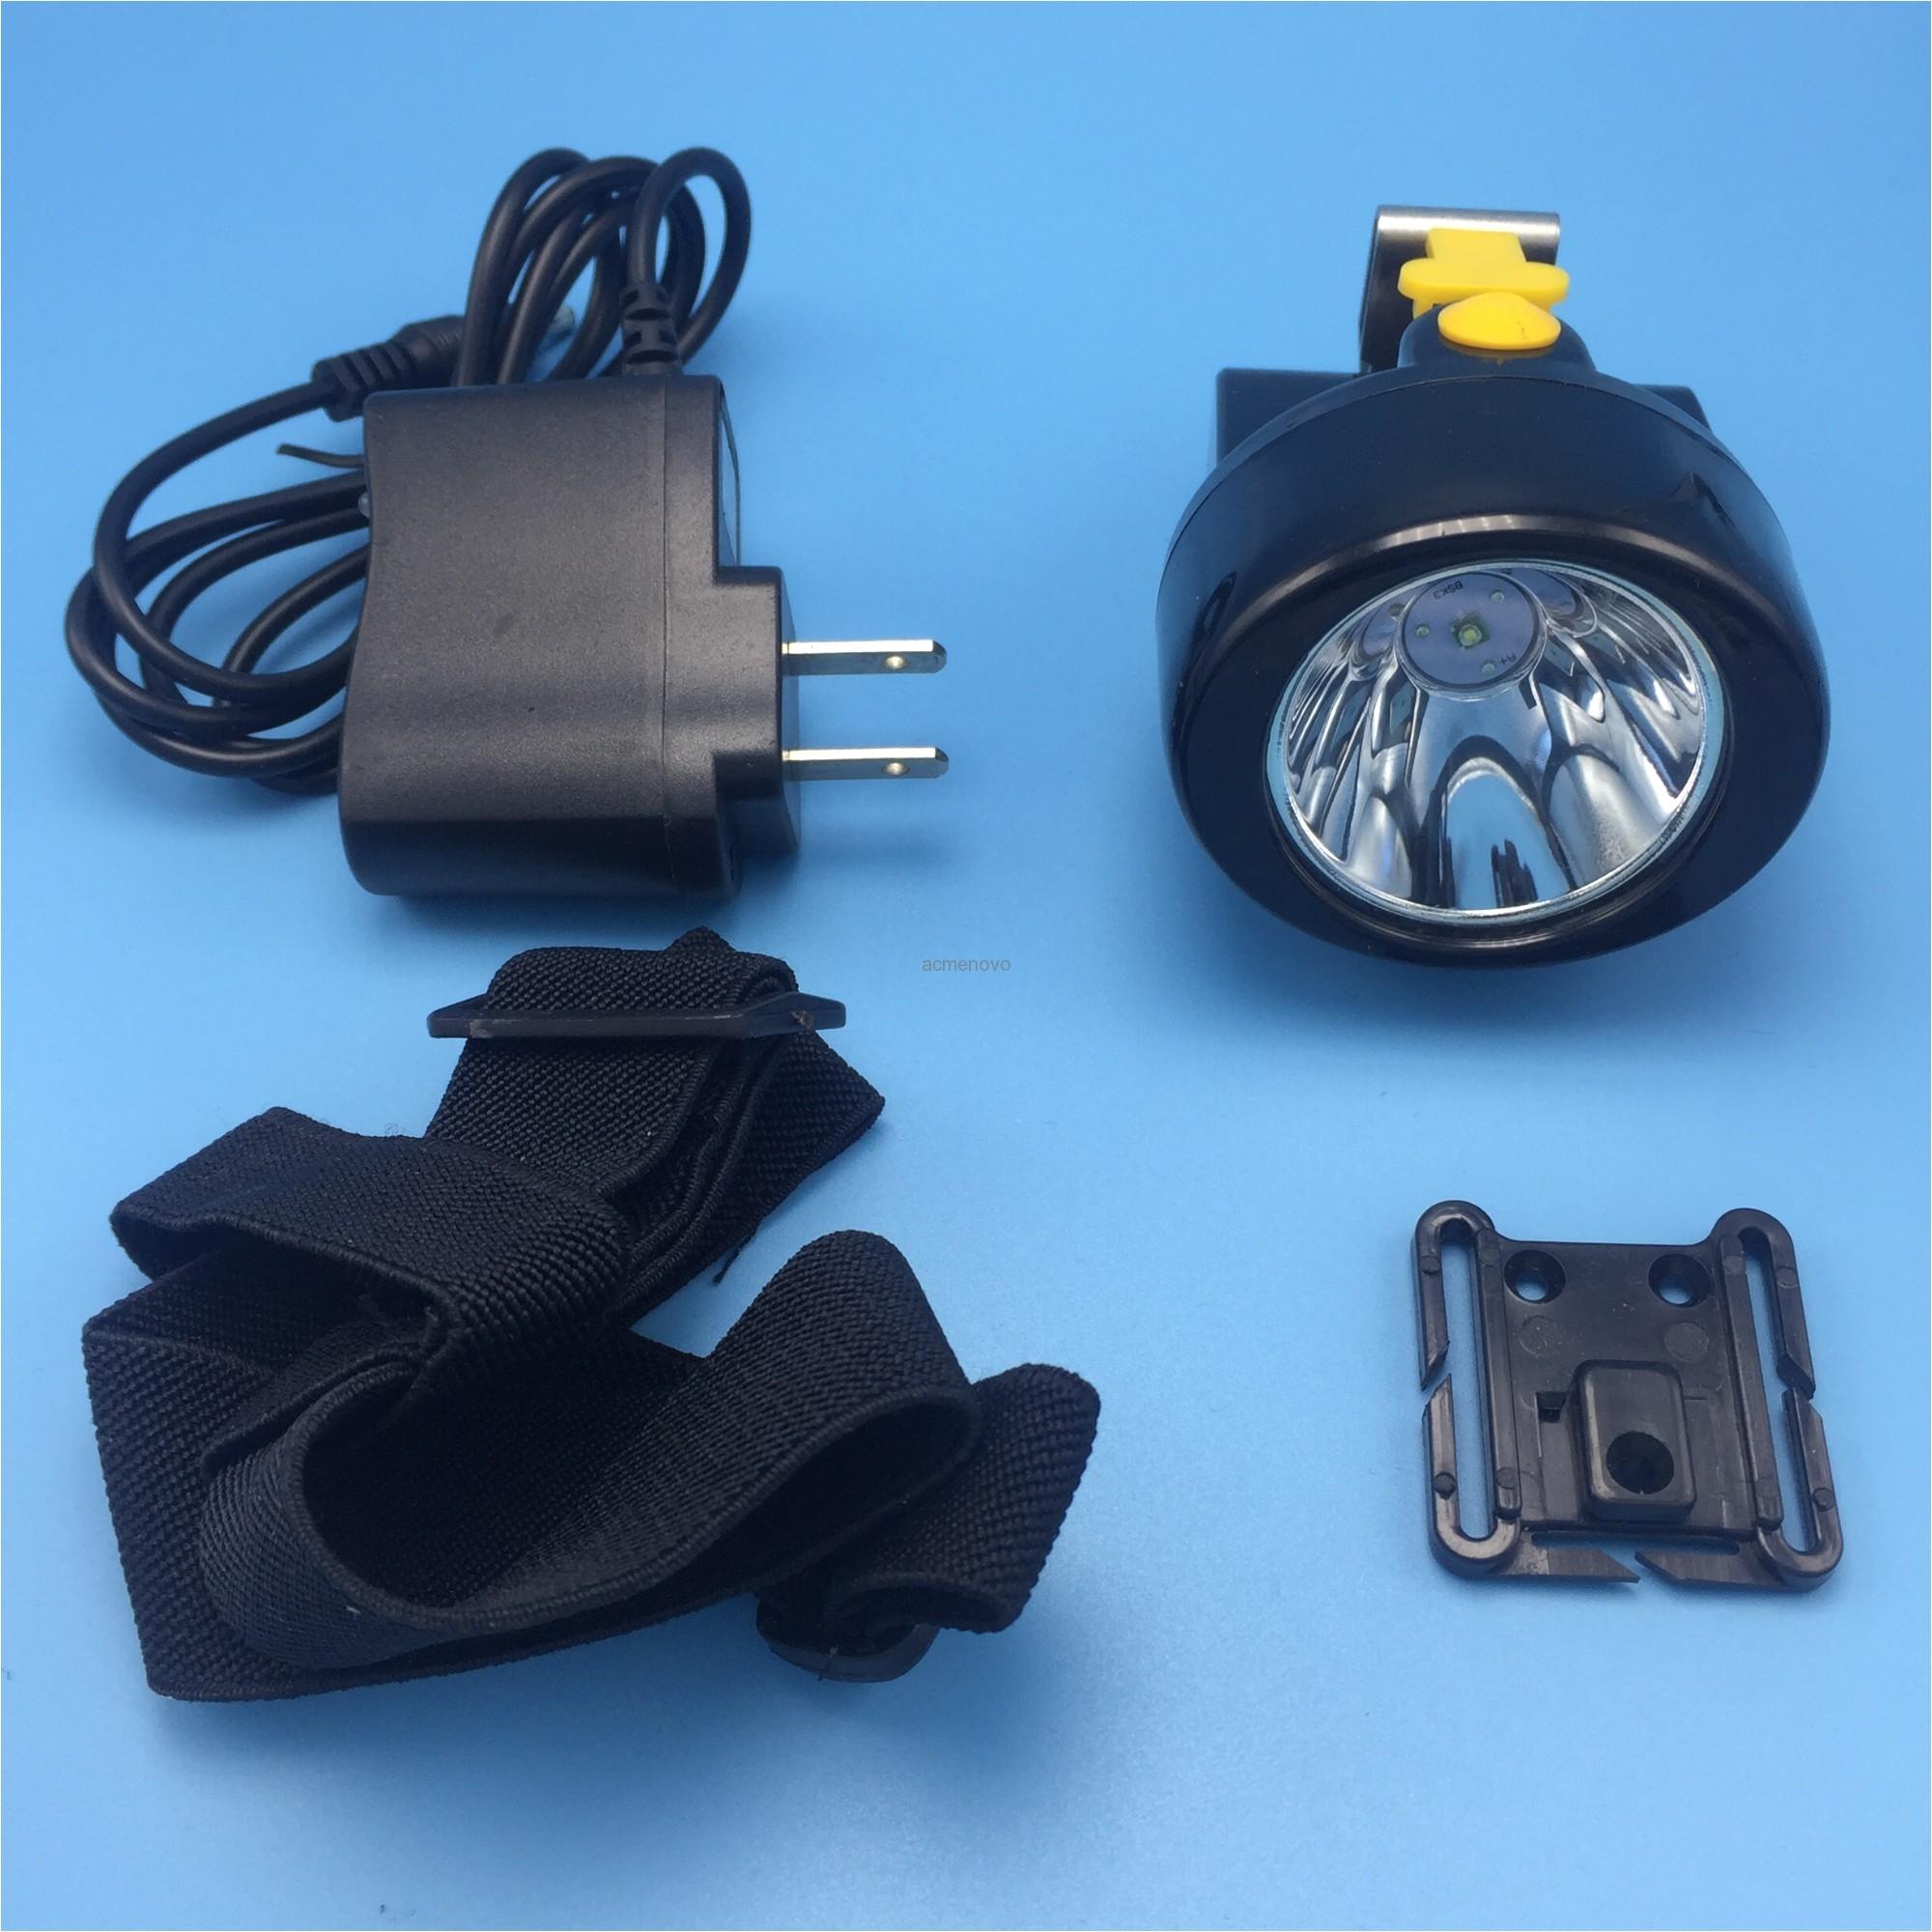 kl2 5lm led mining cordless headlamp 2500mah battery miner cordless head lamp